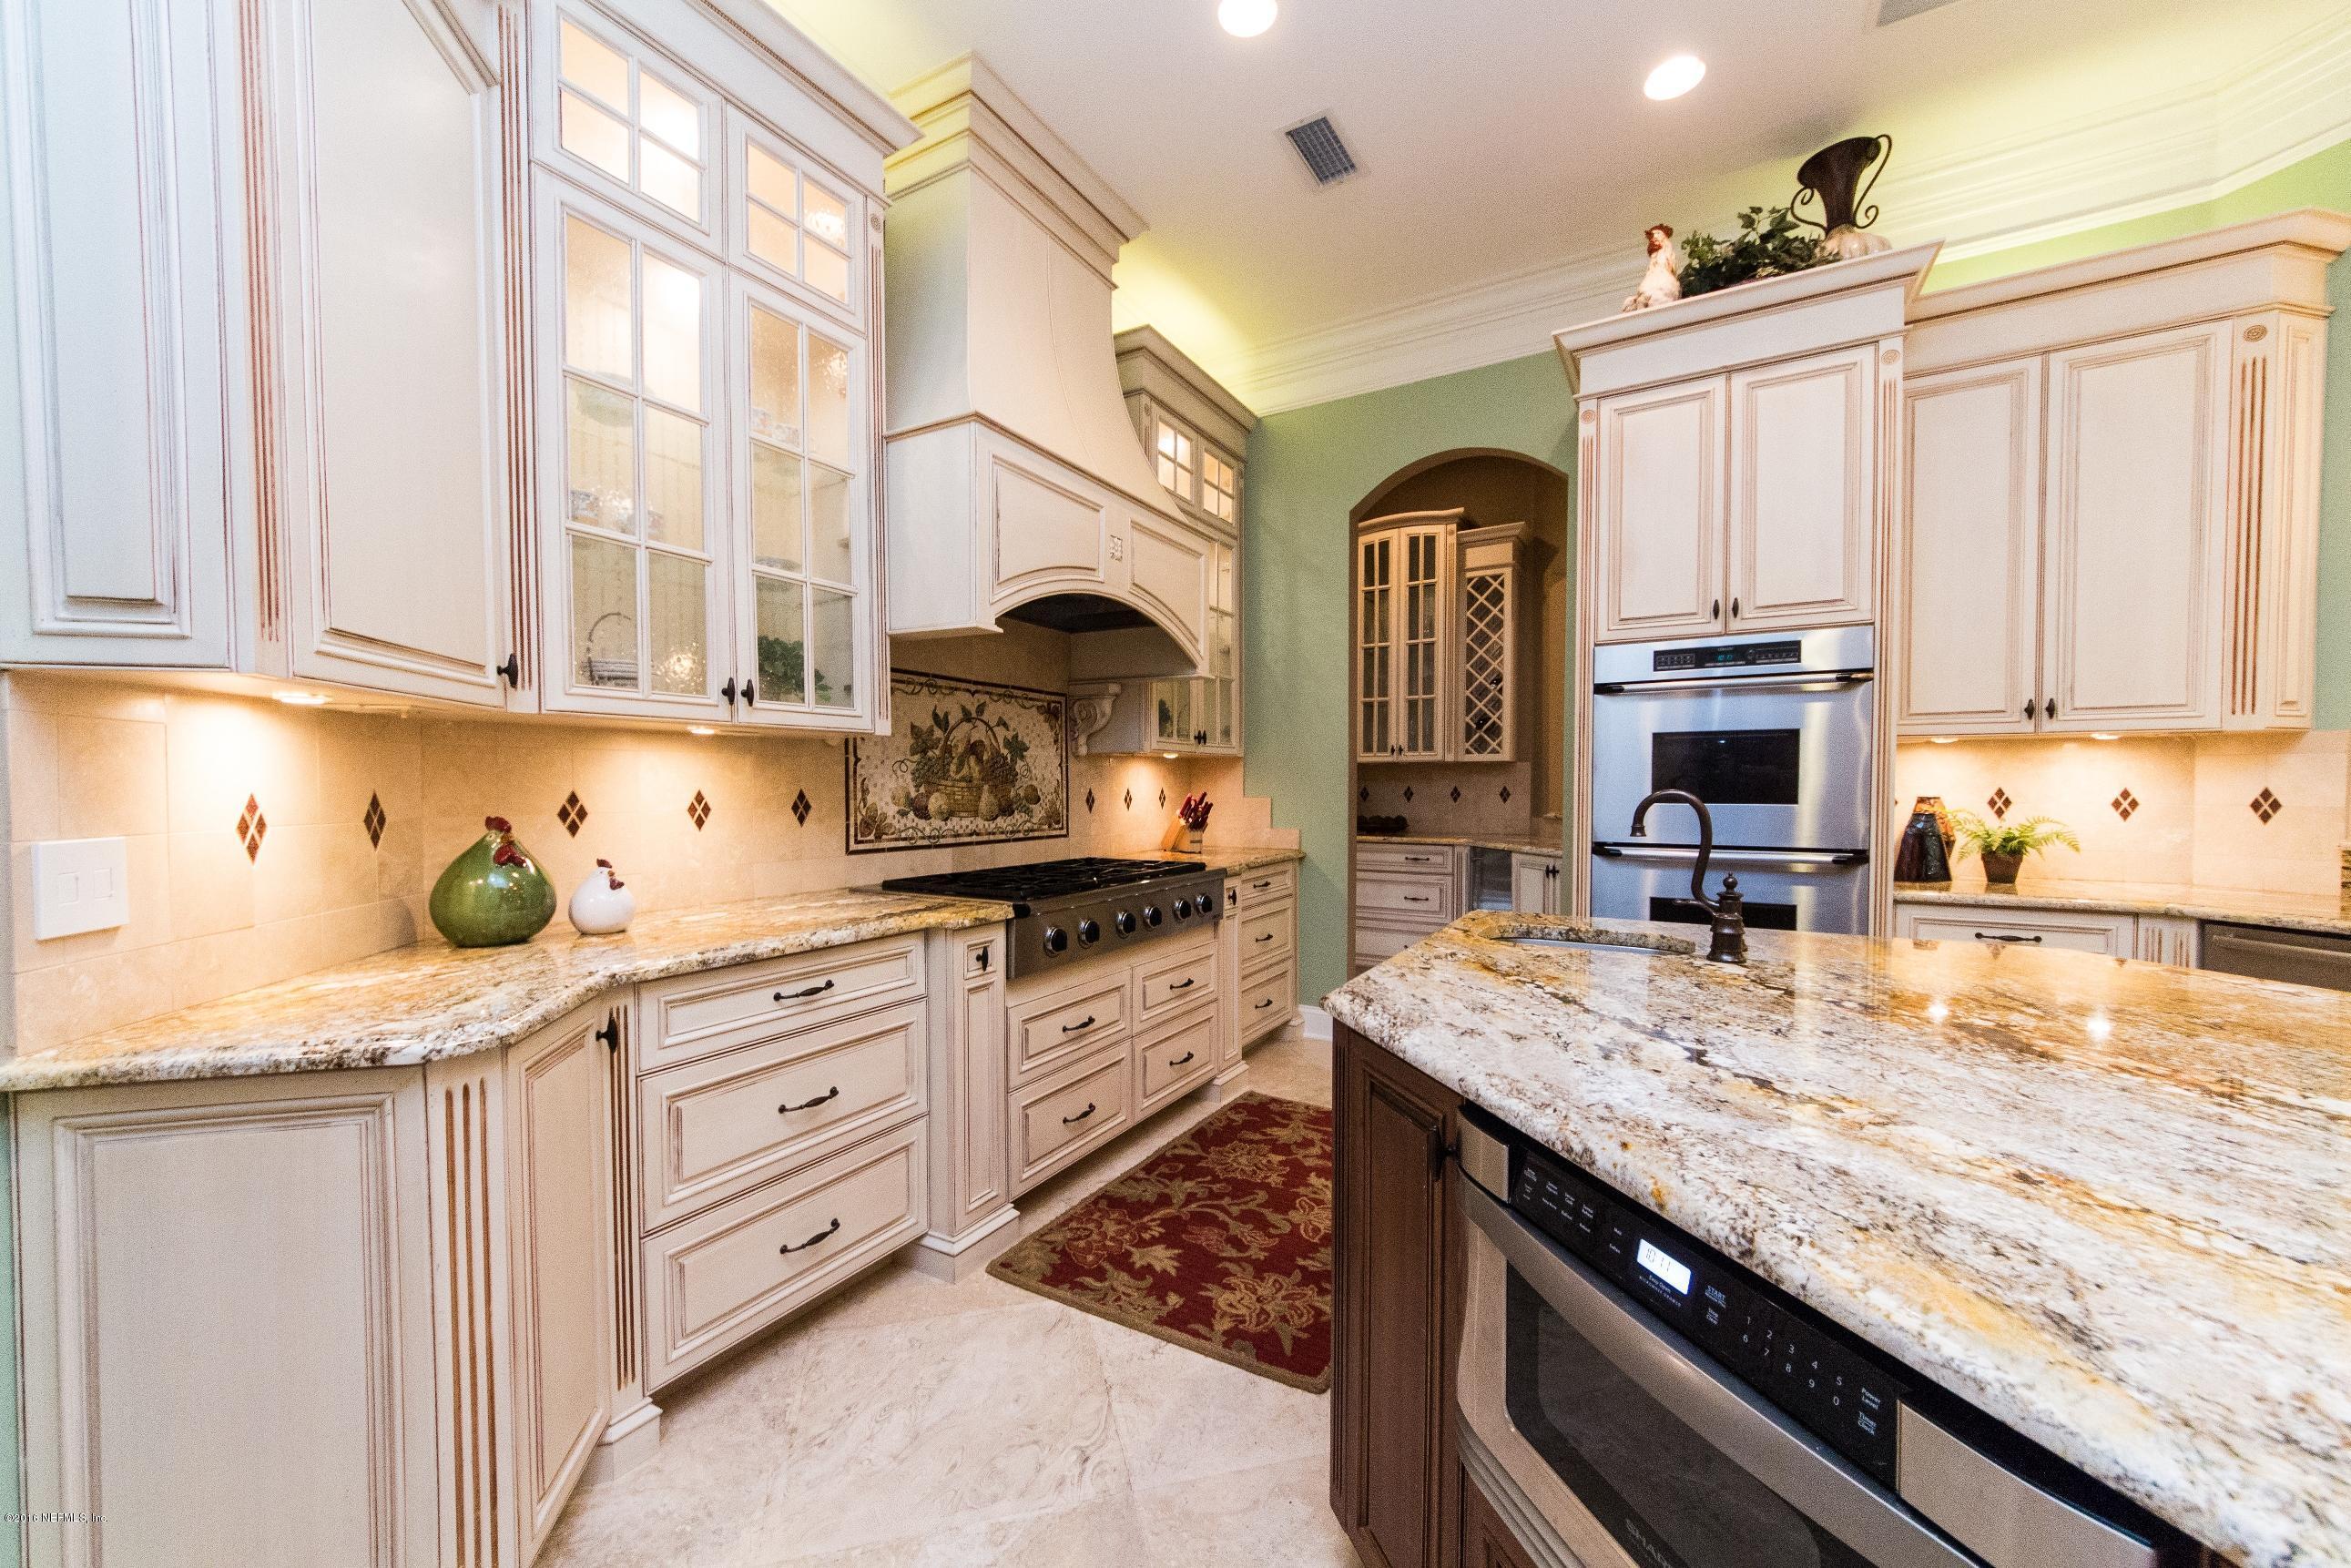 7230 OAKMONT, PONTE VEDRA BEACH, FLORIDA 32082, 6 Bedrooms Bedrooms, ,7 BathroomsBathrooms,Residential - single family,For sale,OAKMONT,844850